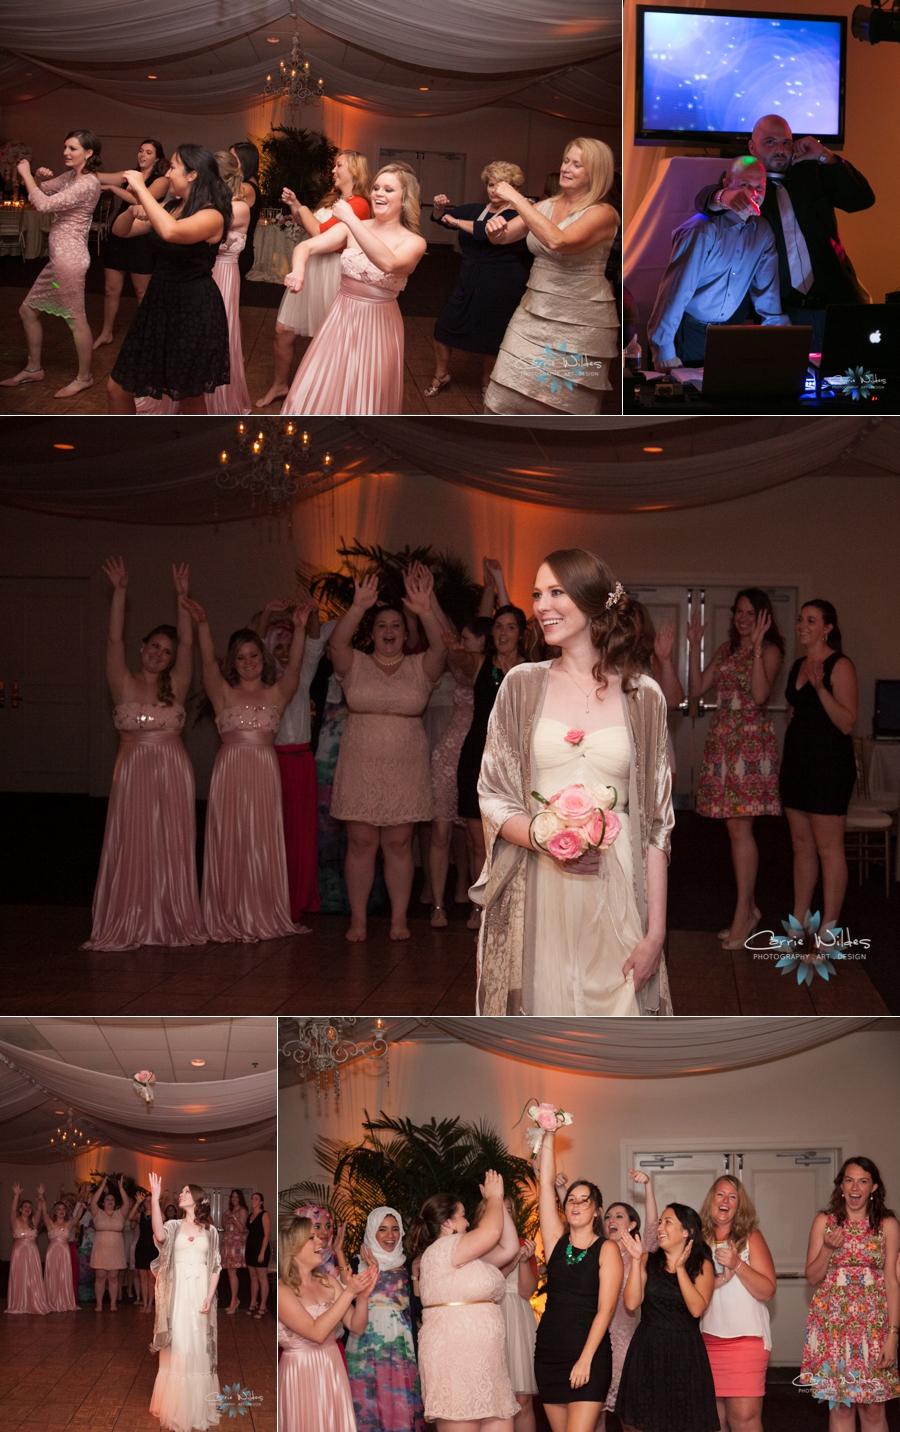 8_25_13 A La Event Pavilion Wedding Tampa_0018.jpg